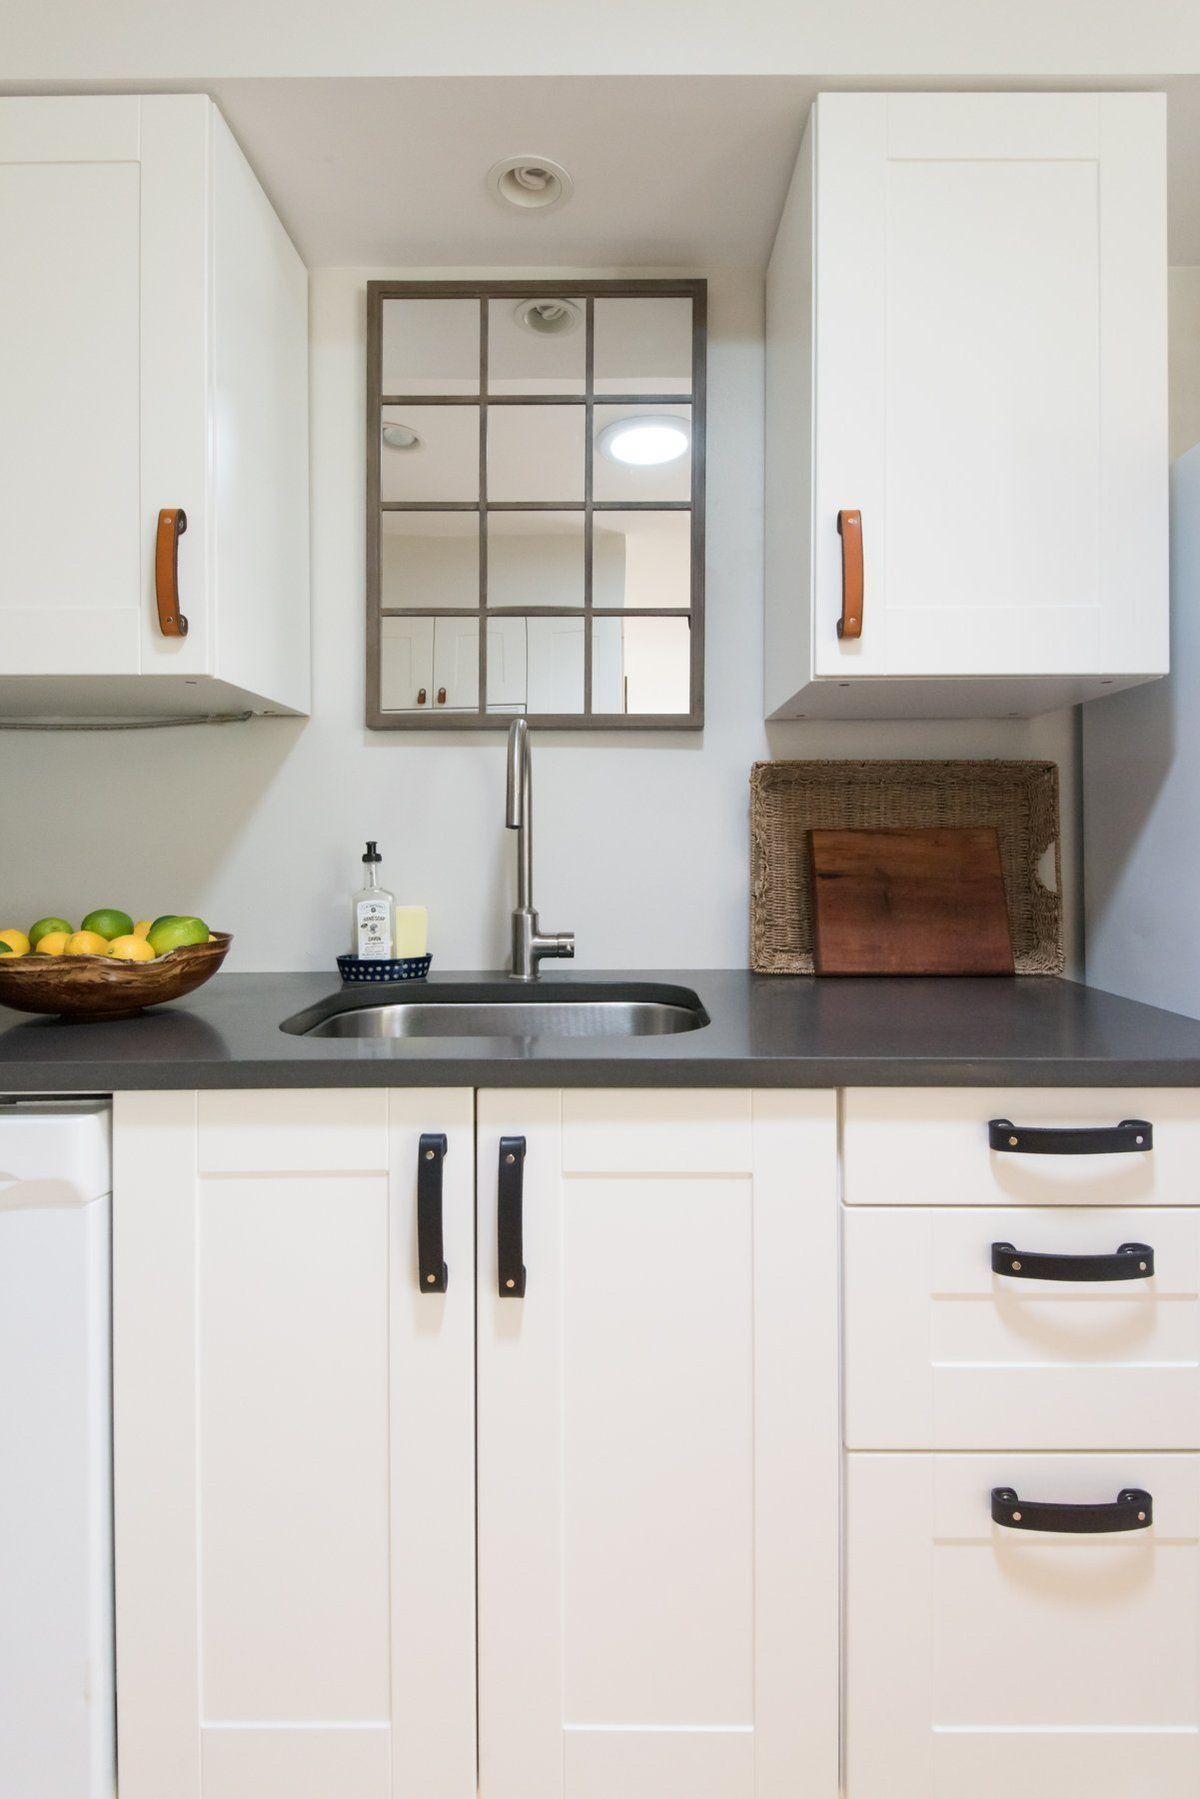 Leather Handle - The Tilikum - 3 Sizes | New kitchen ...